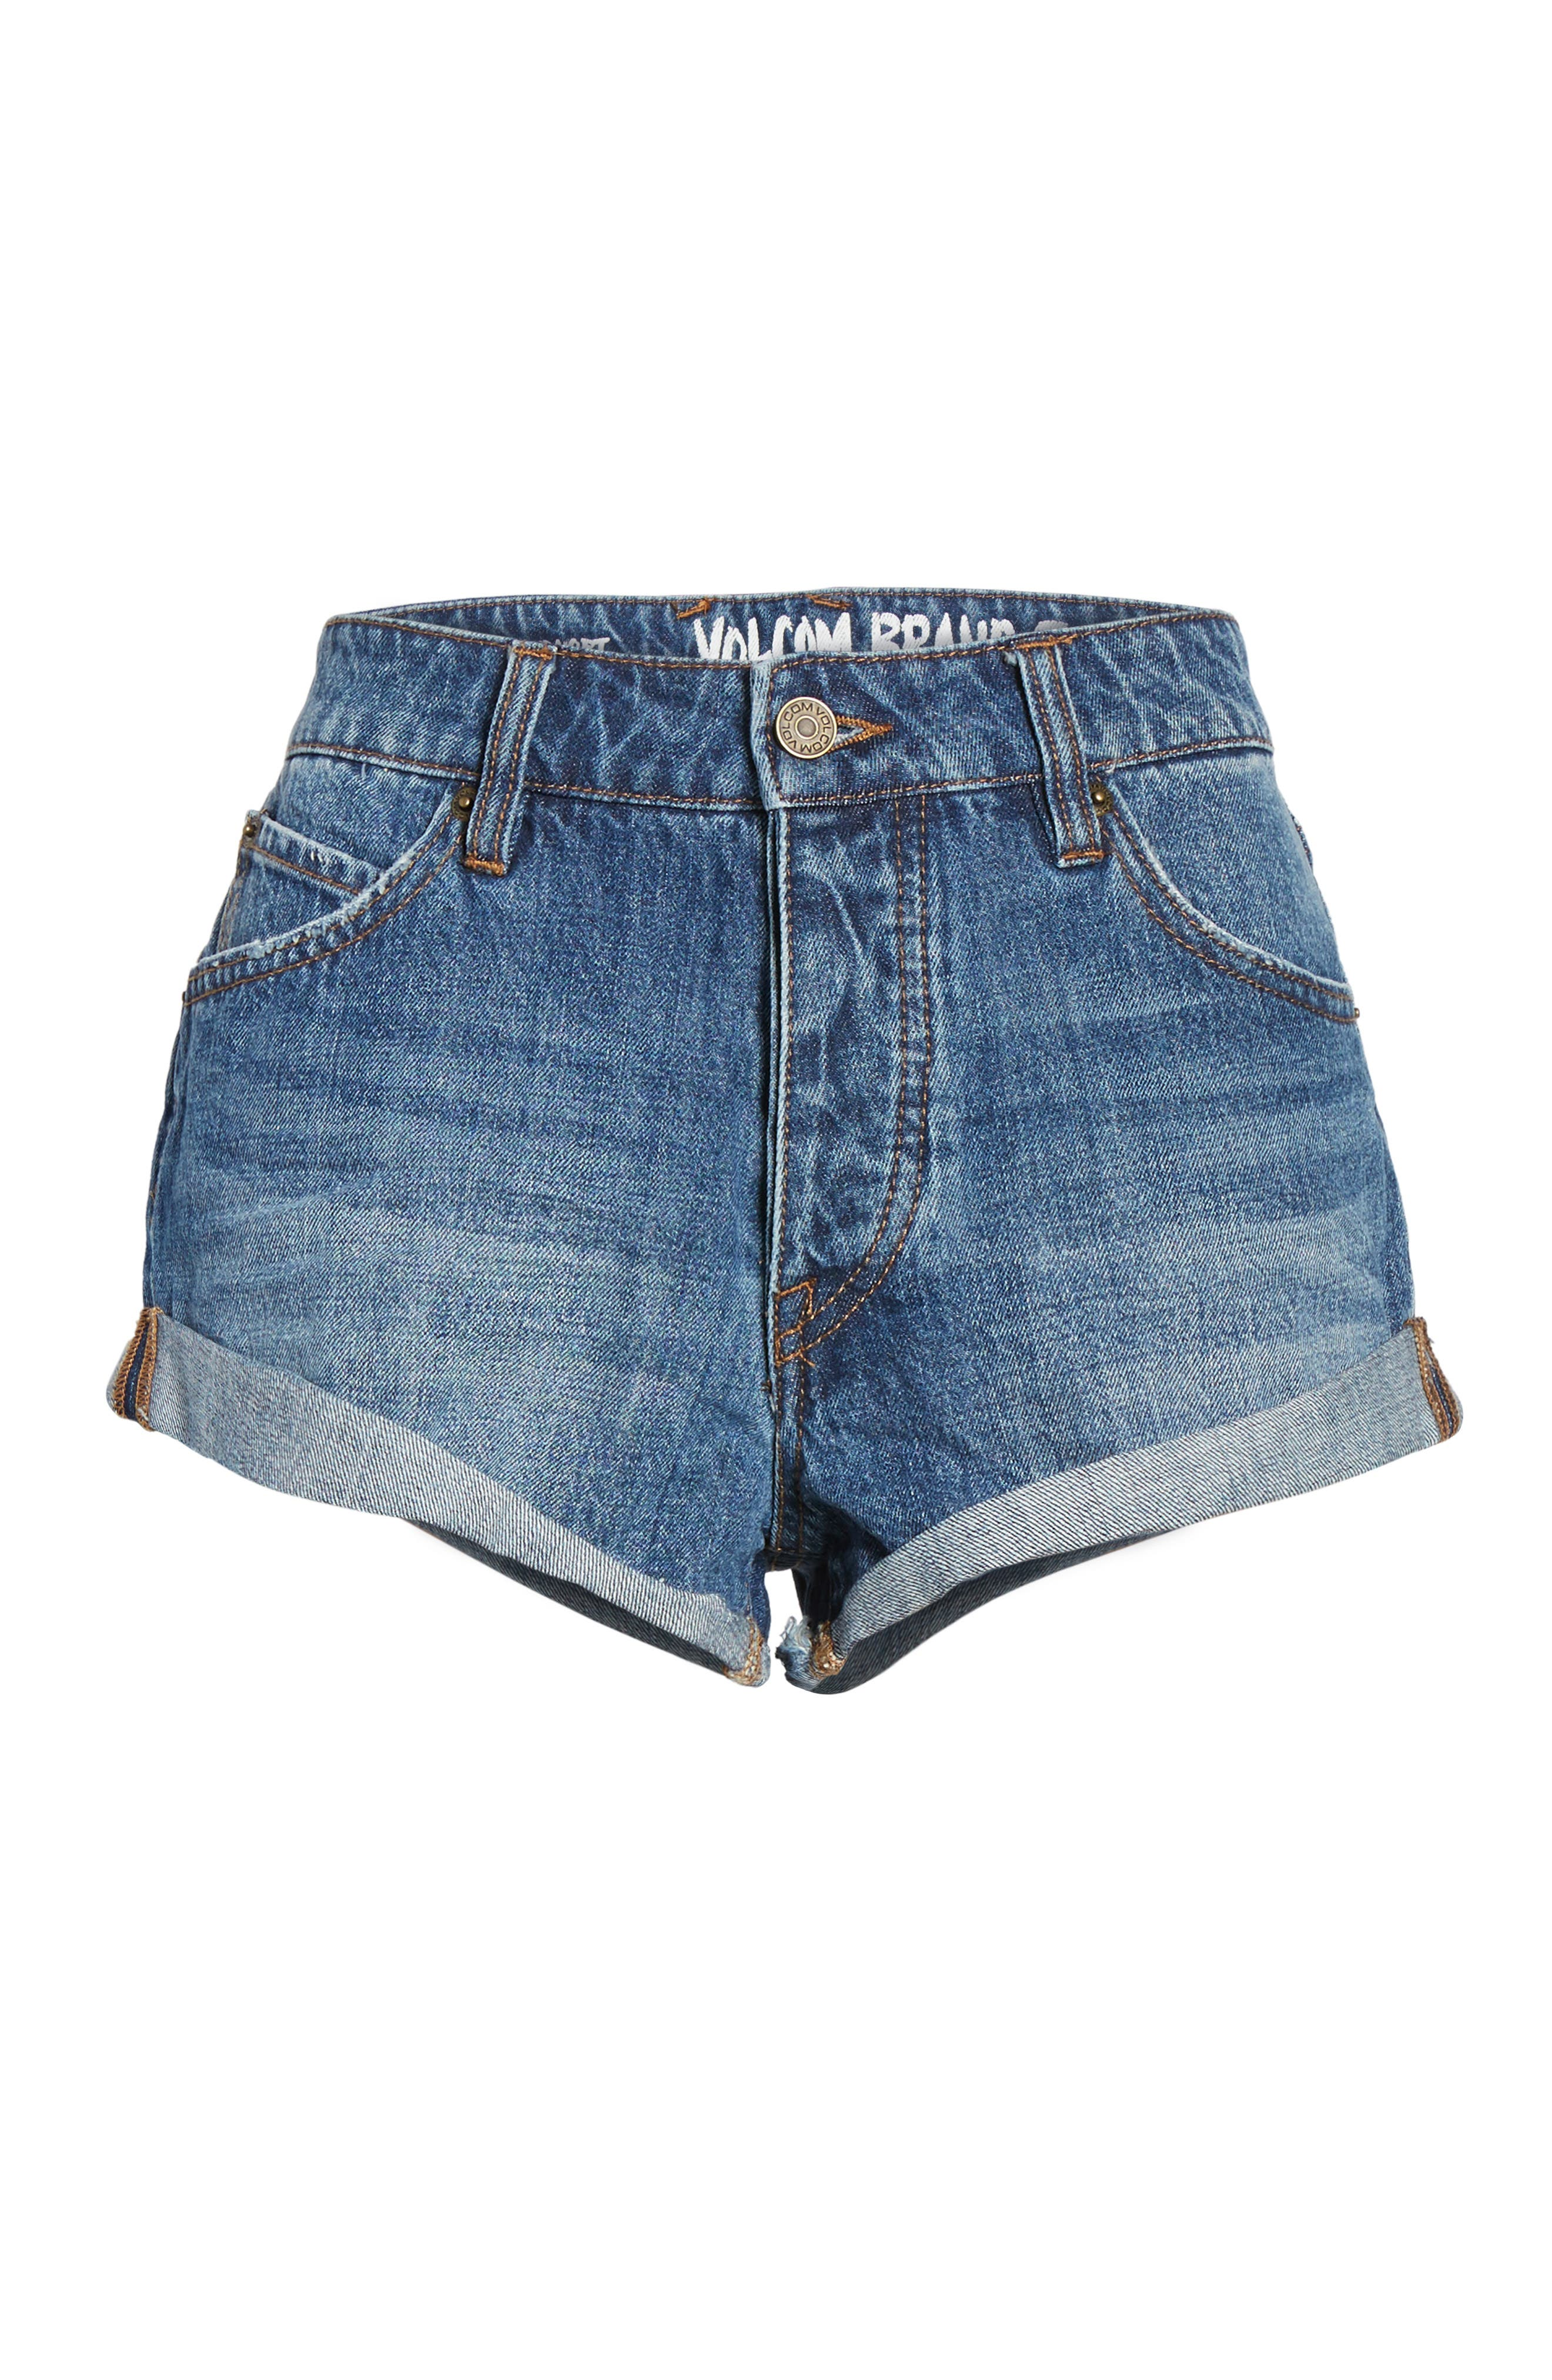 Rolled Denim Shorts,                             Alternate thumbnail 6, color,                             409